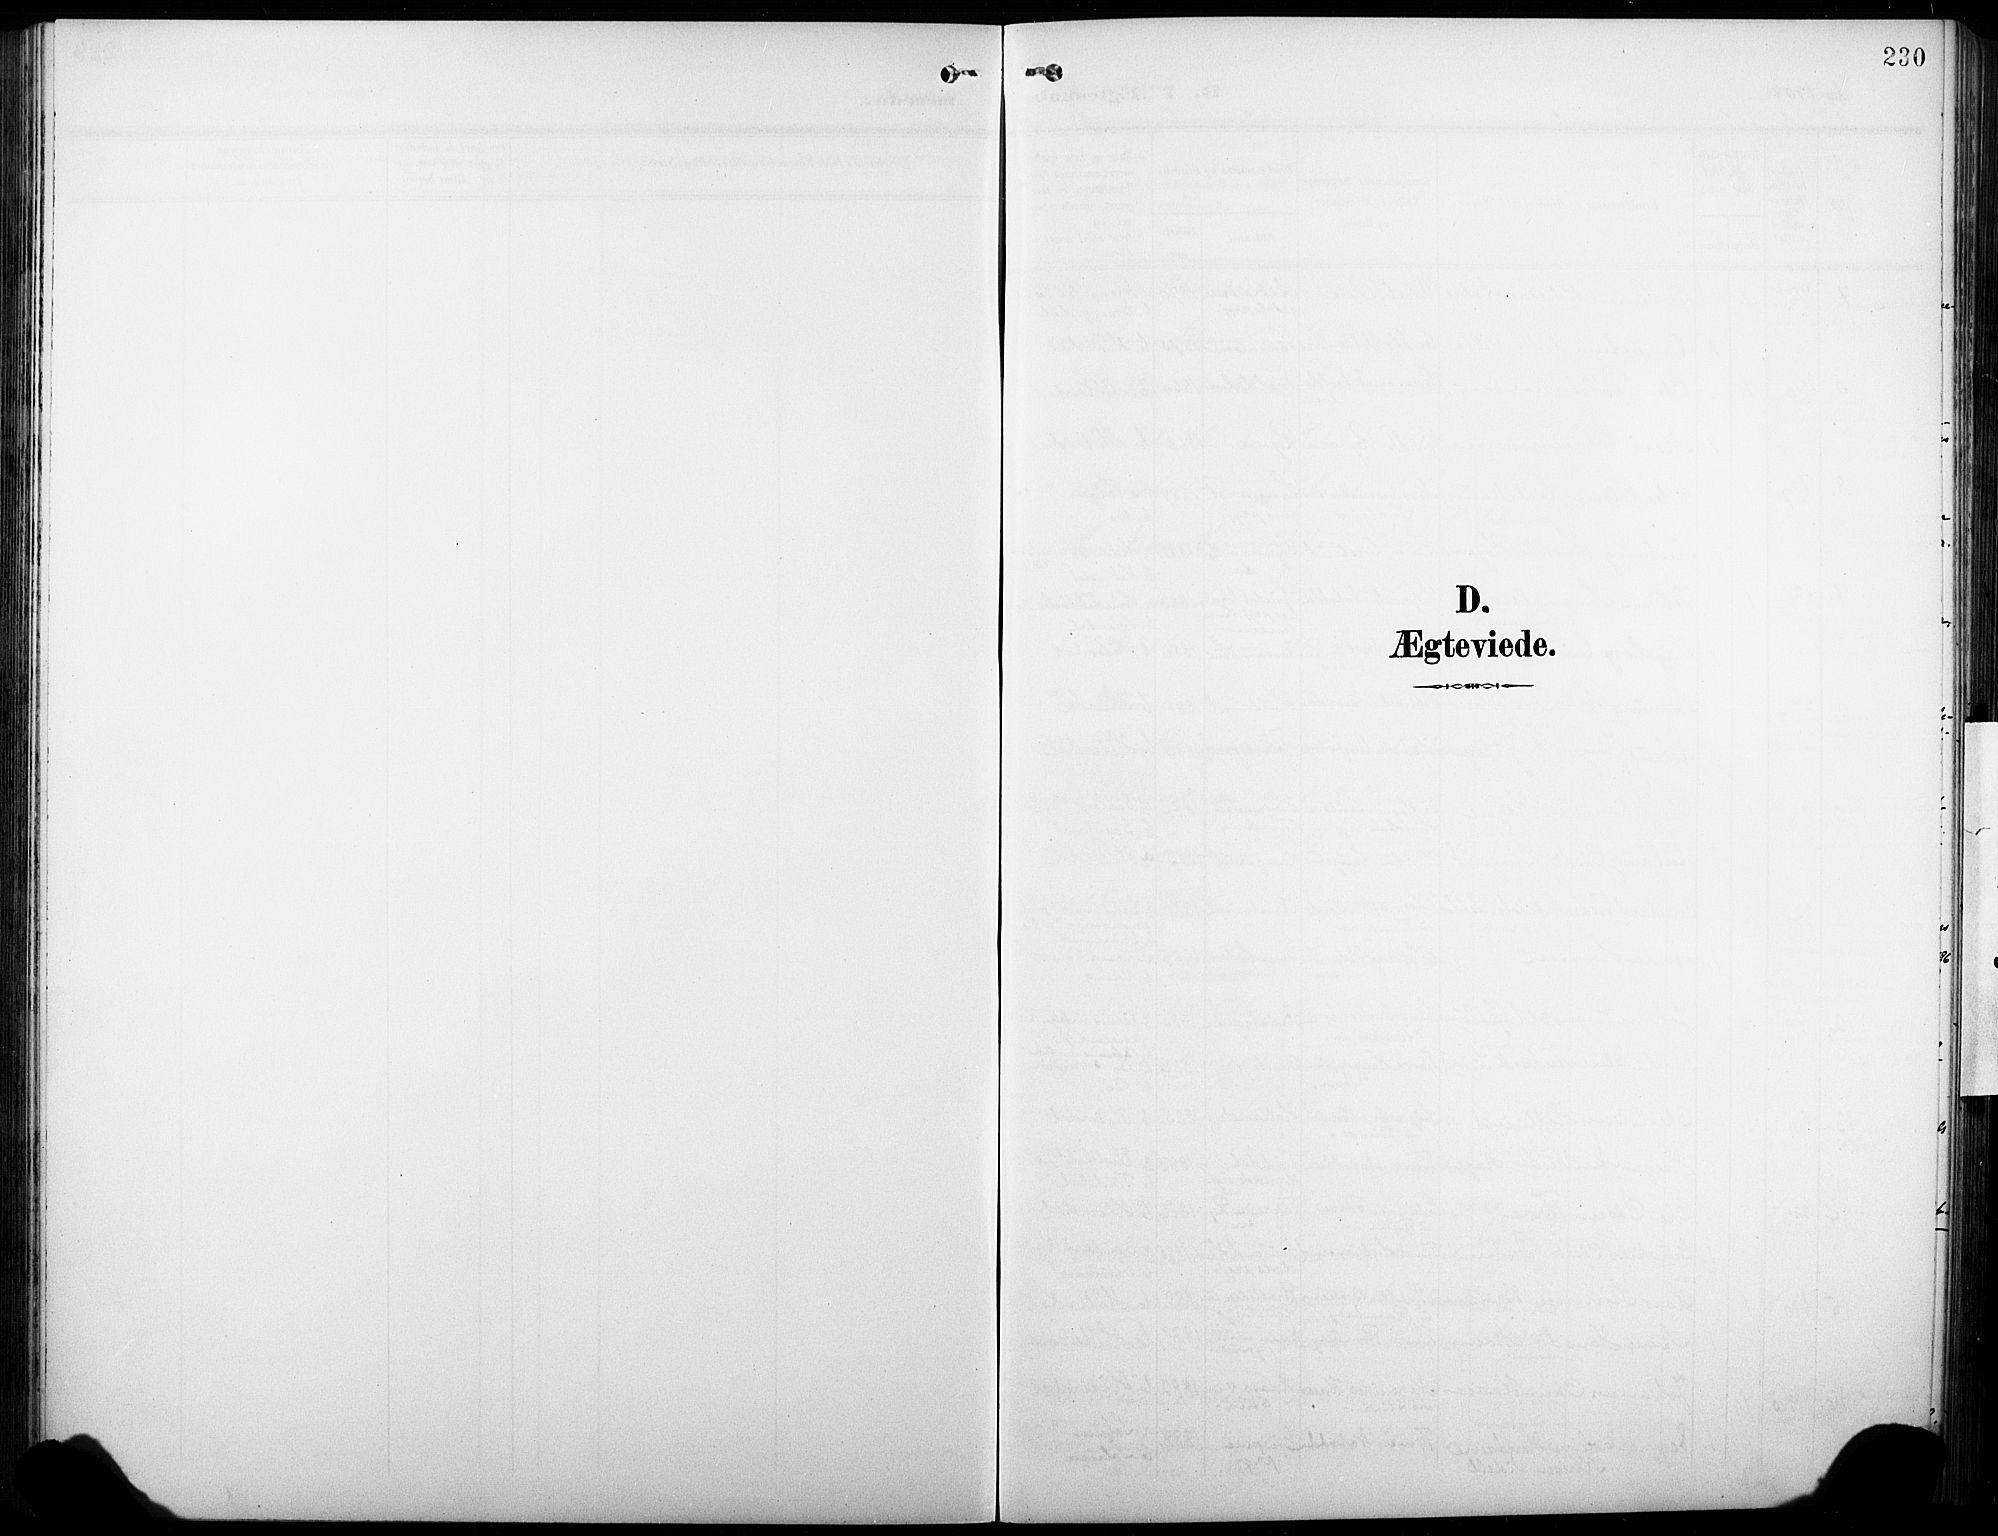 SAKO, Heddal kirkebøker, G/Ga/L0003: Klokkerbok nr. I 3, 1908-1932, s. 230